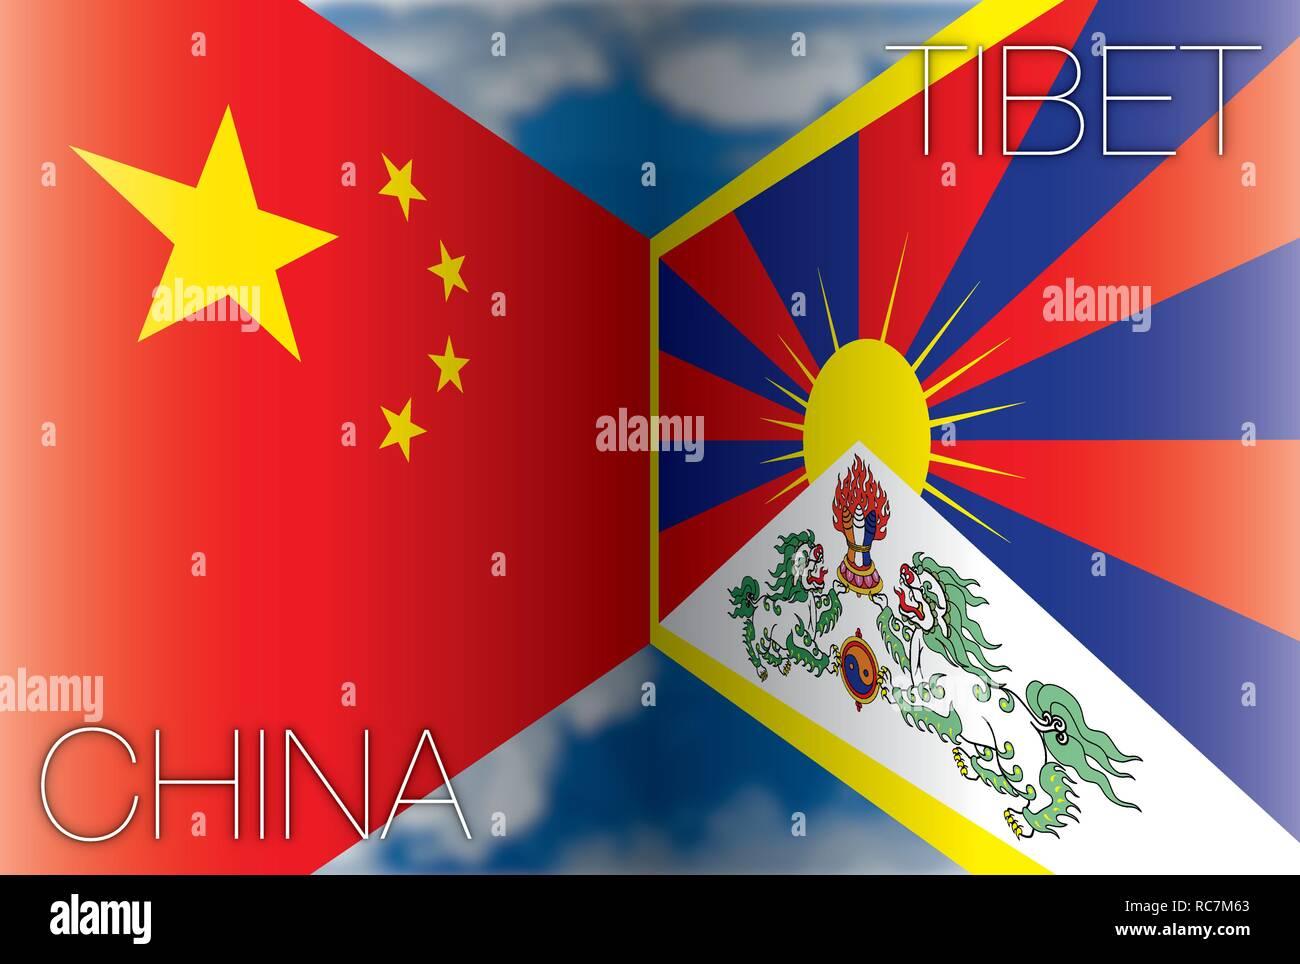 China versus Tibet flags, vector illustration - Stock Vector